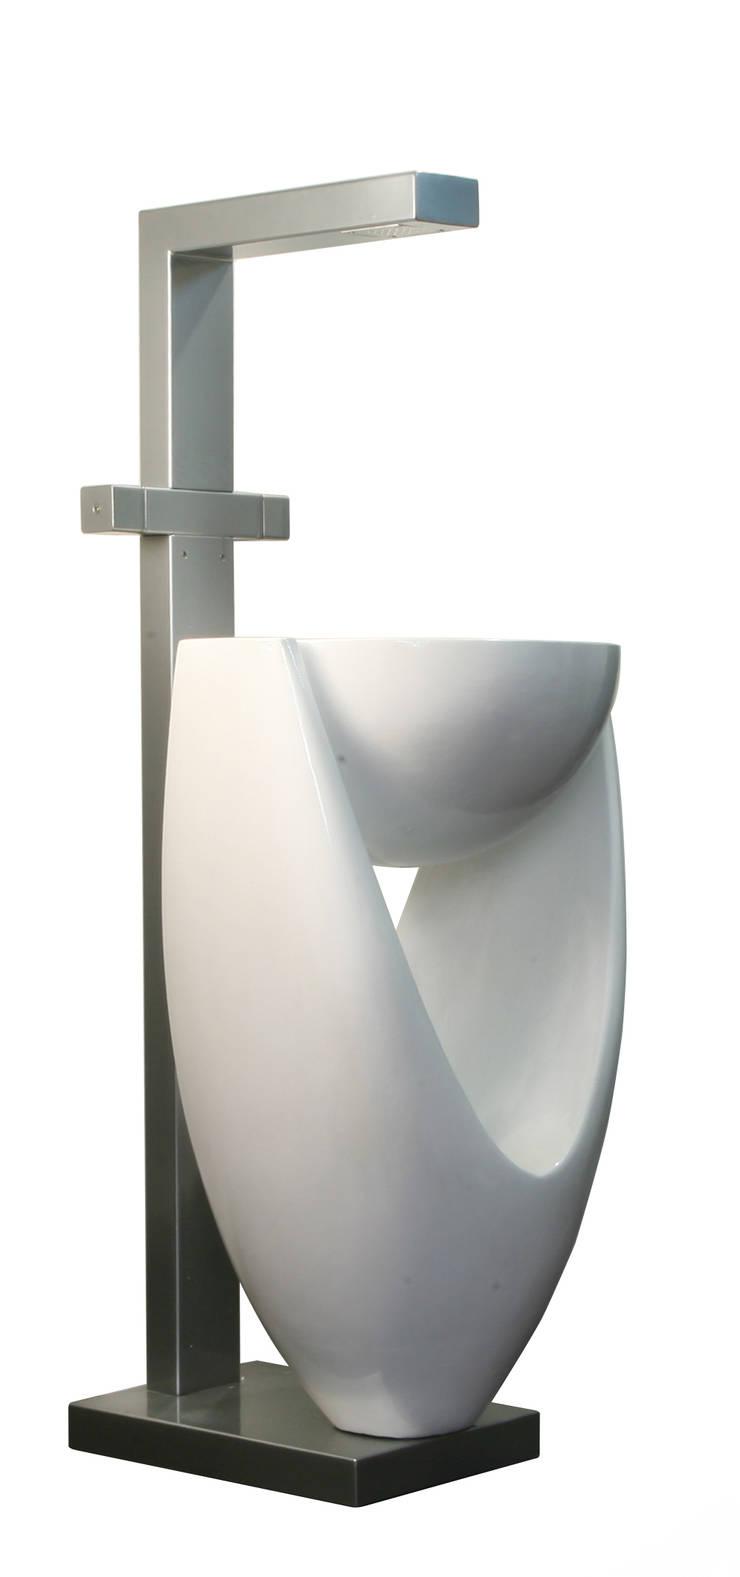 Lavabo Pantarei: Bagno in stile  di Alessandra Scarfò Design